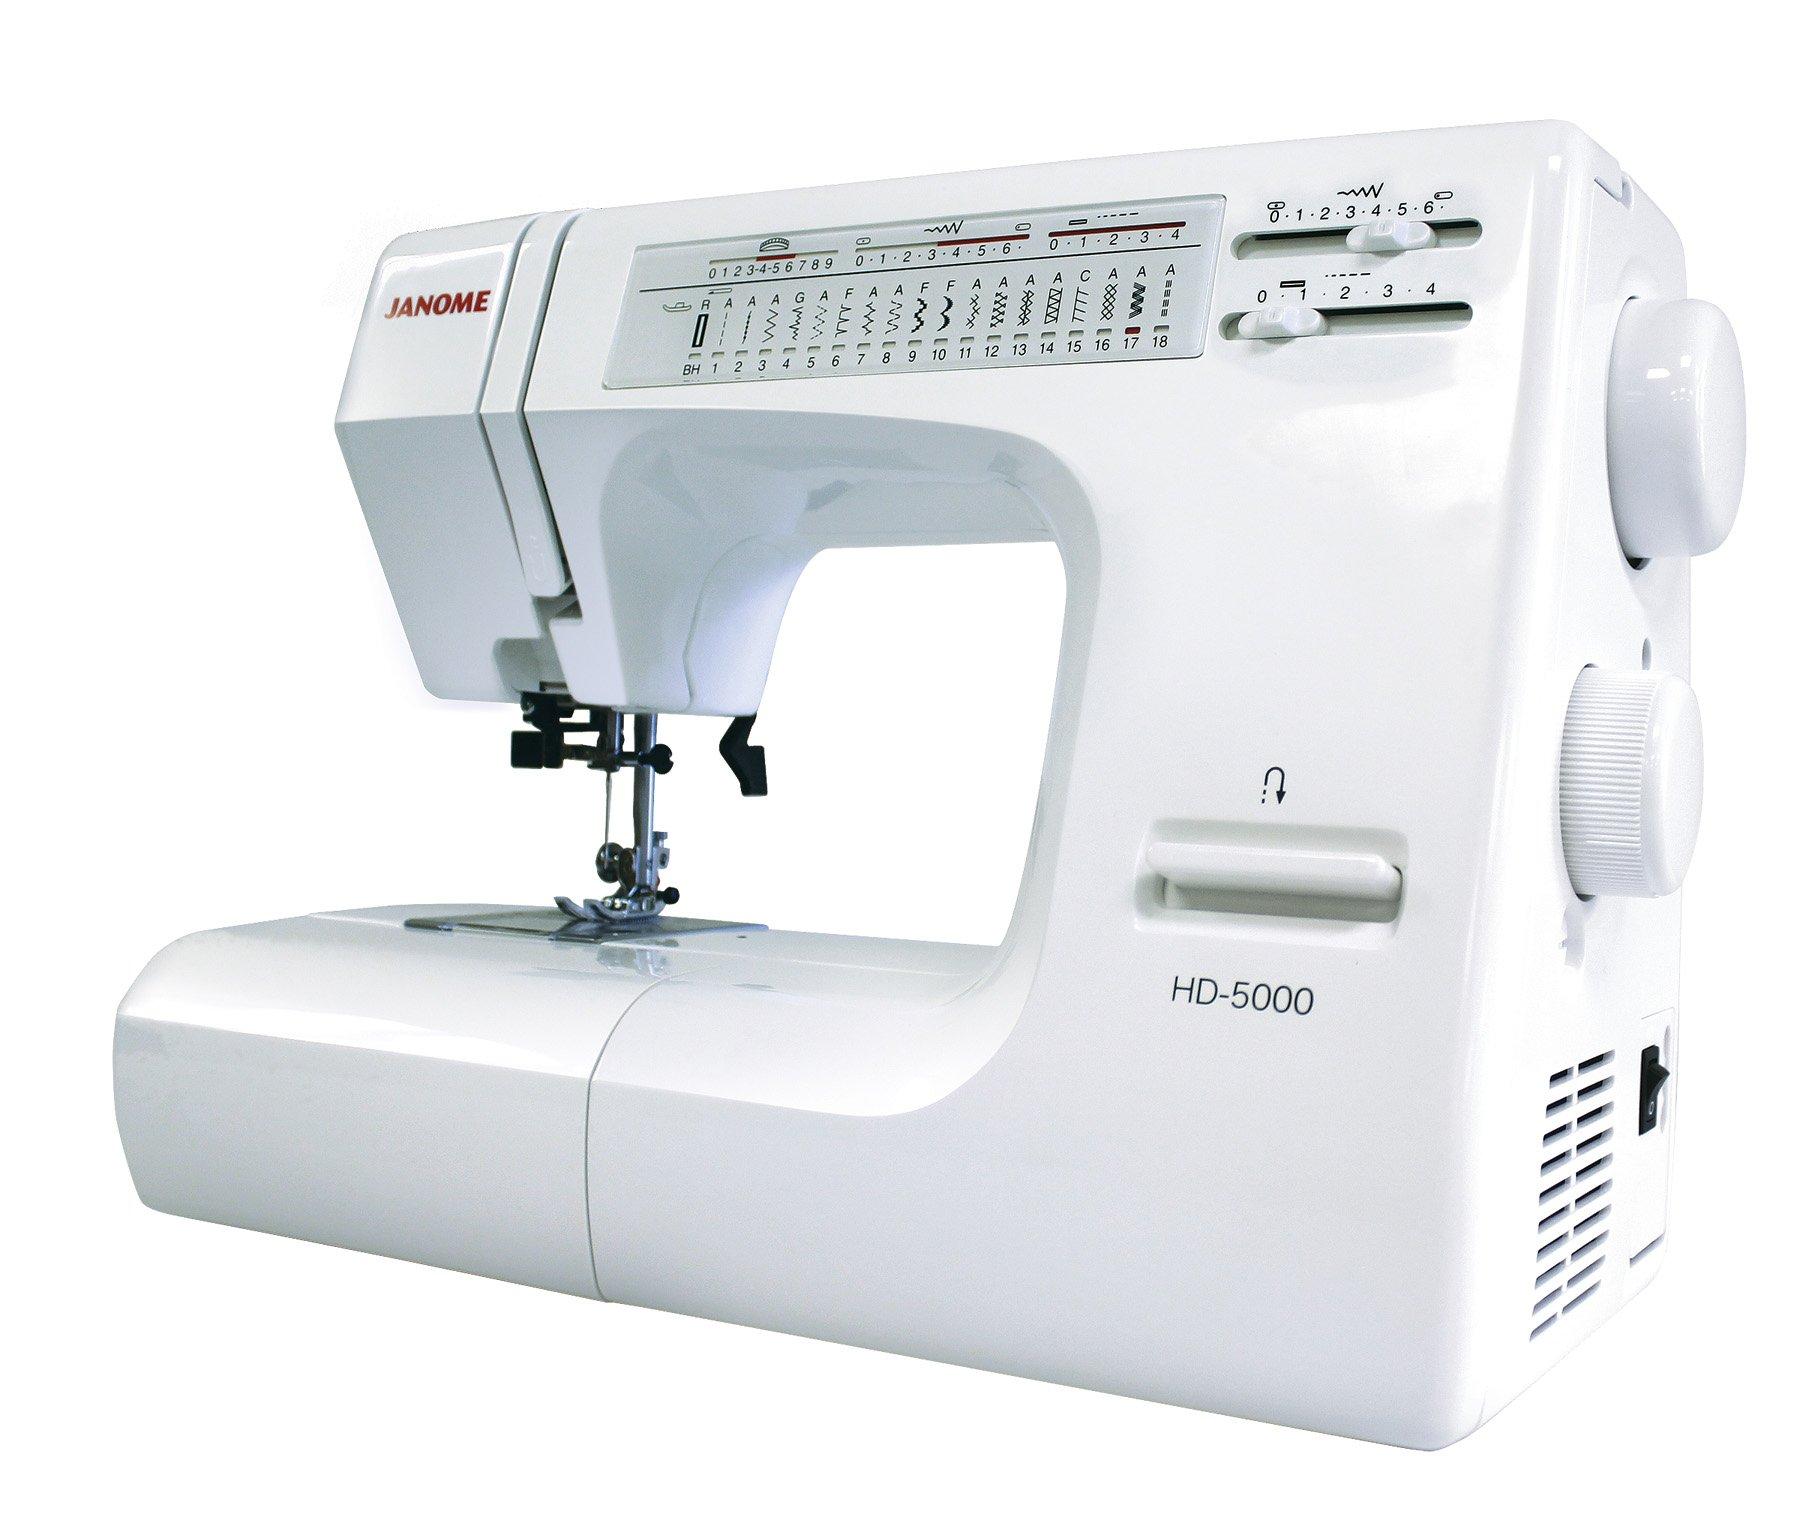 HD5000